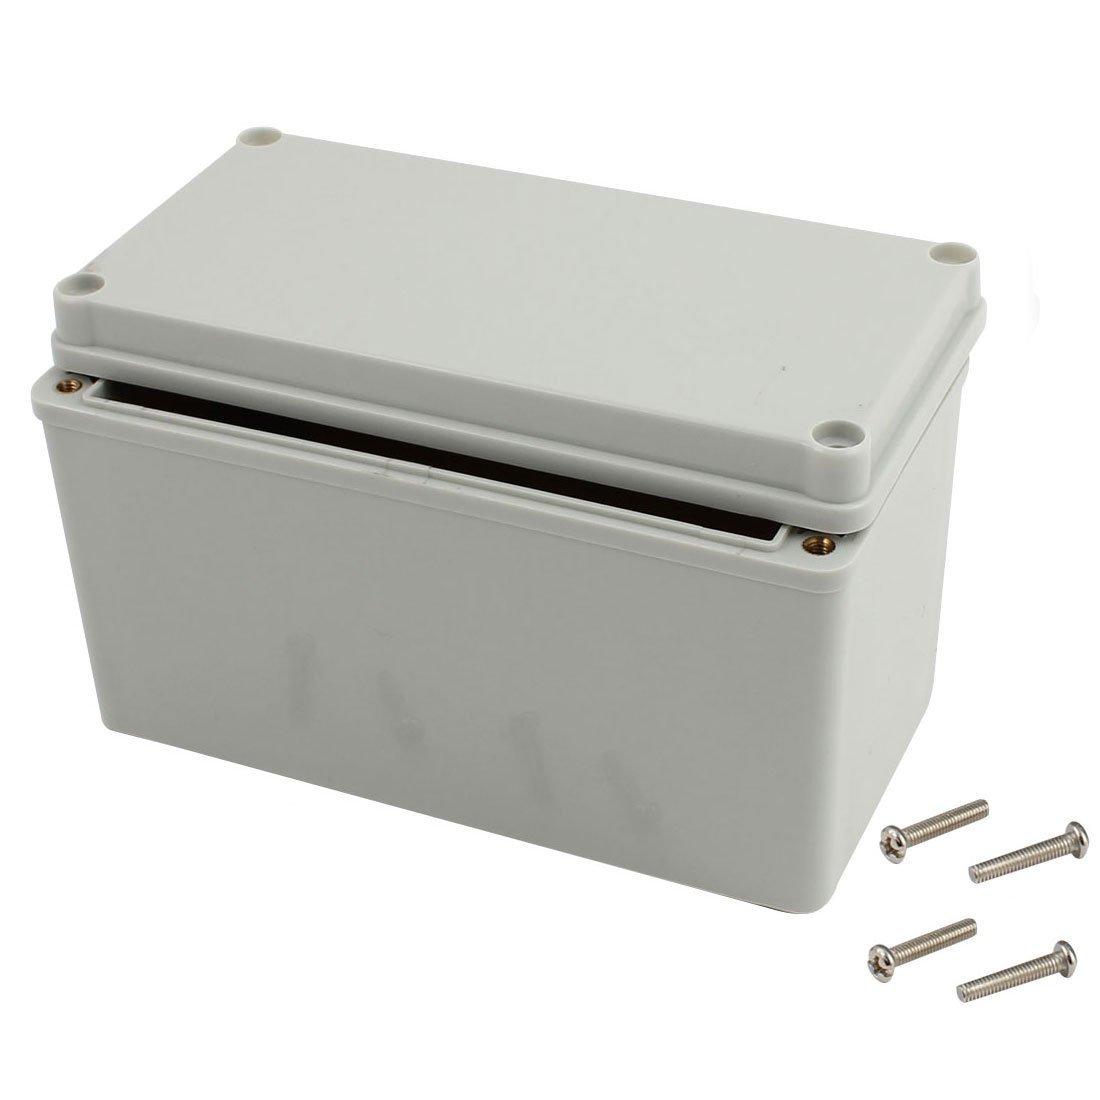 "Awclub 6.4""x3.2""x3.8""(160mmx80mmx95mm) Dustproof IP65 Junction Box DIY Case Enclosure Gray"